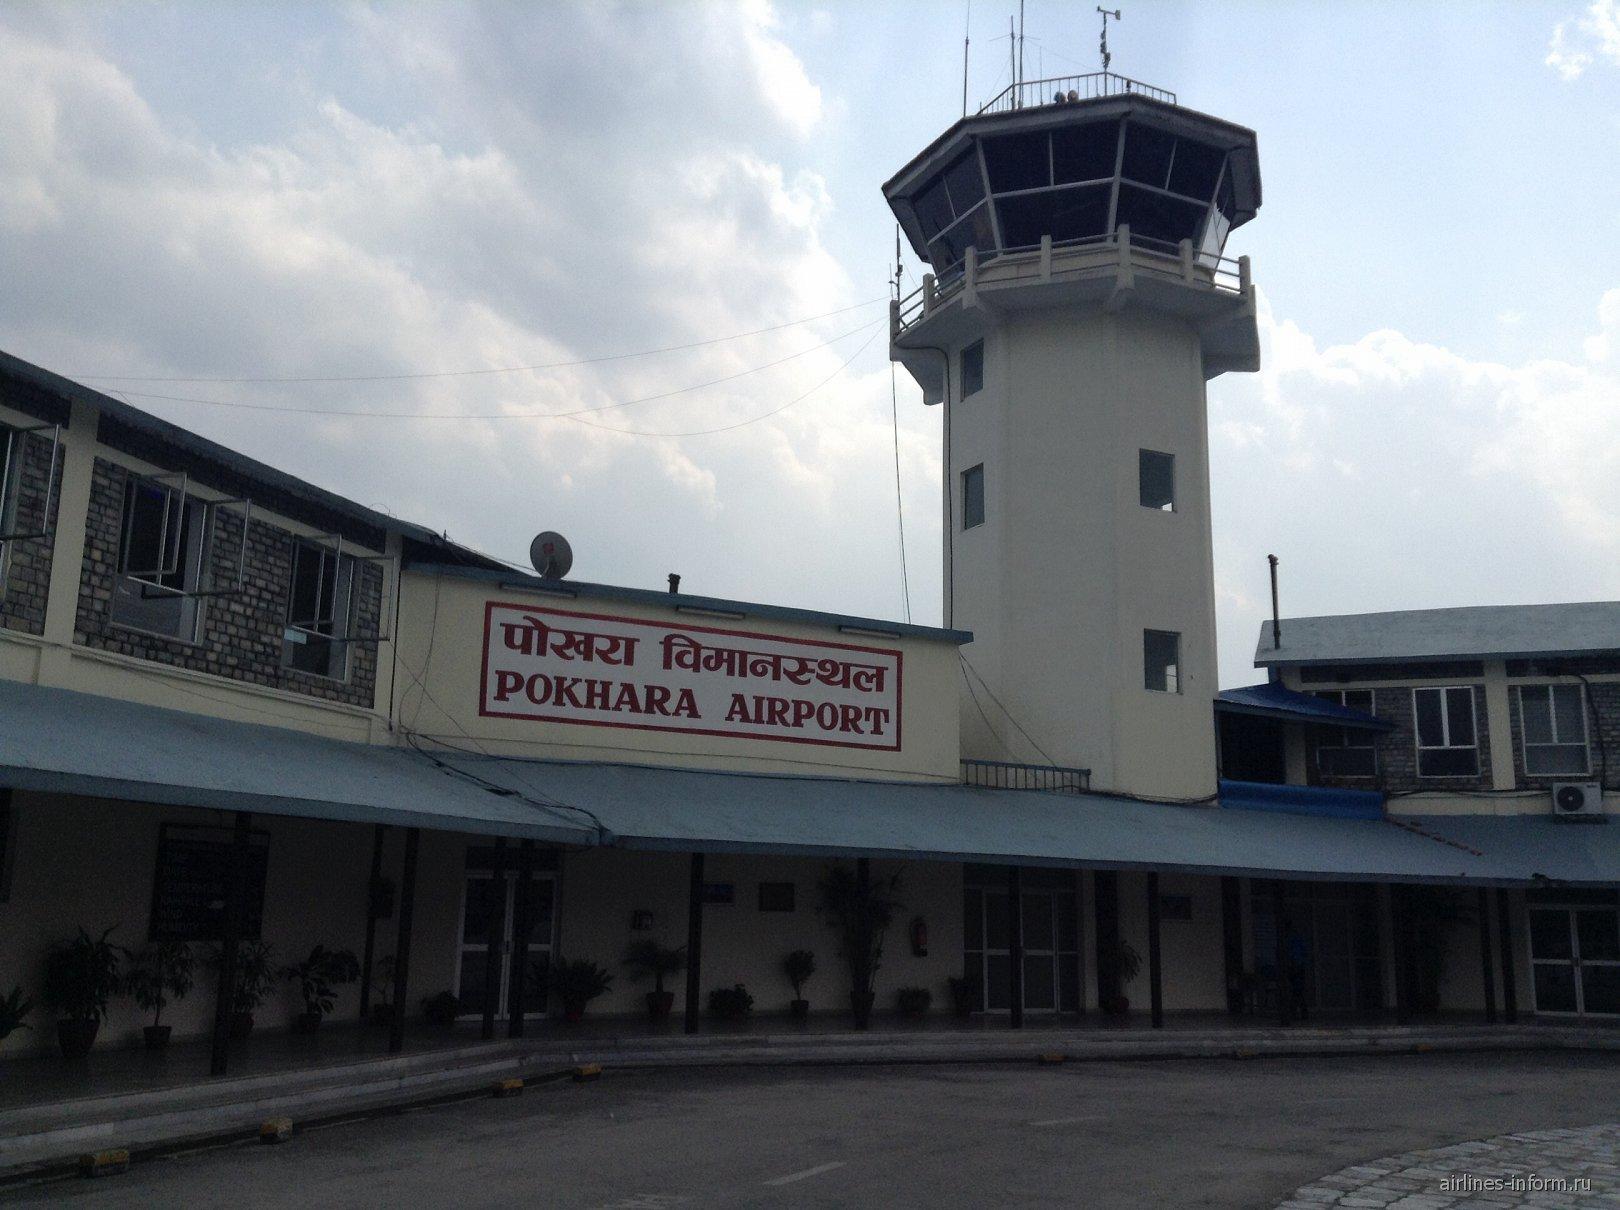 Аэровокзал аэропорта Покхара